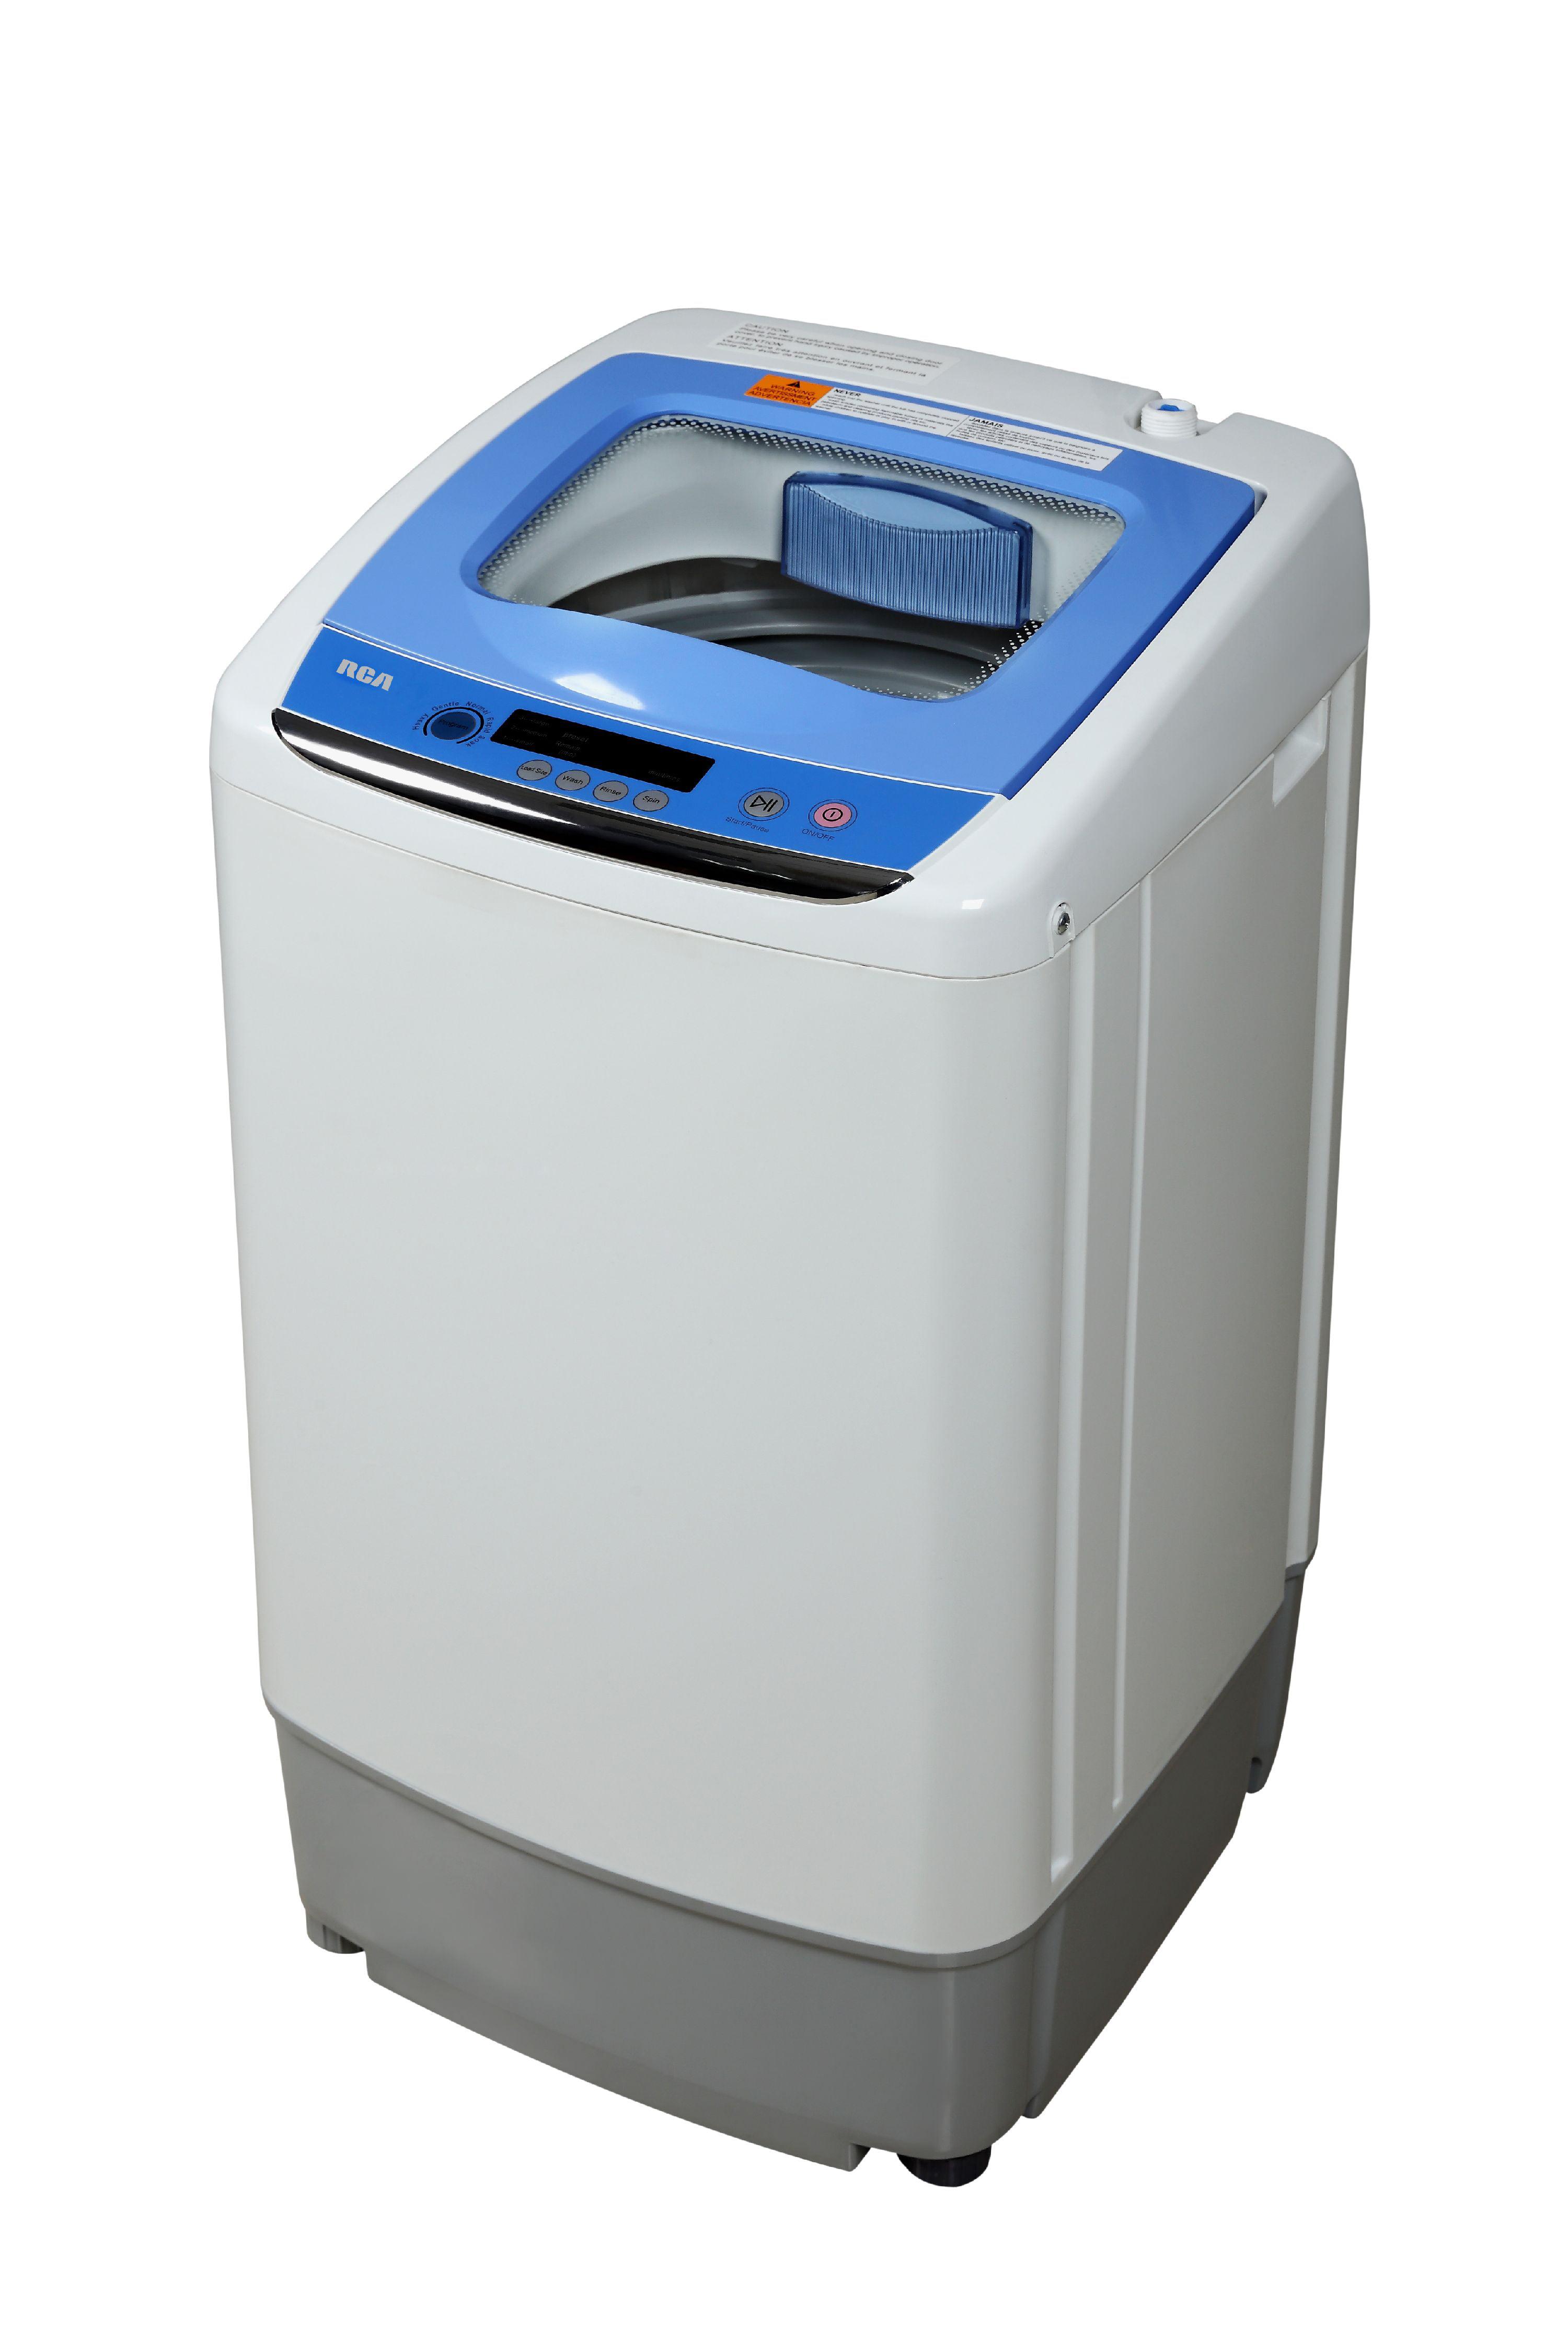 Rca 09 Cu Ft Portable Washer White Haier Washing Machine Wiring Diagram